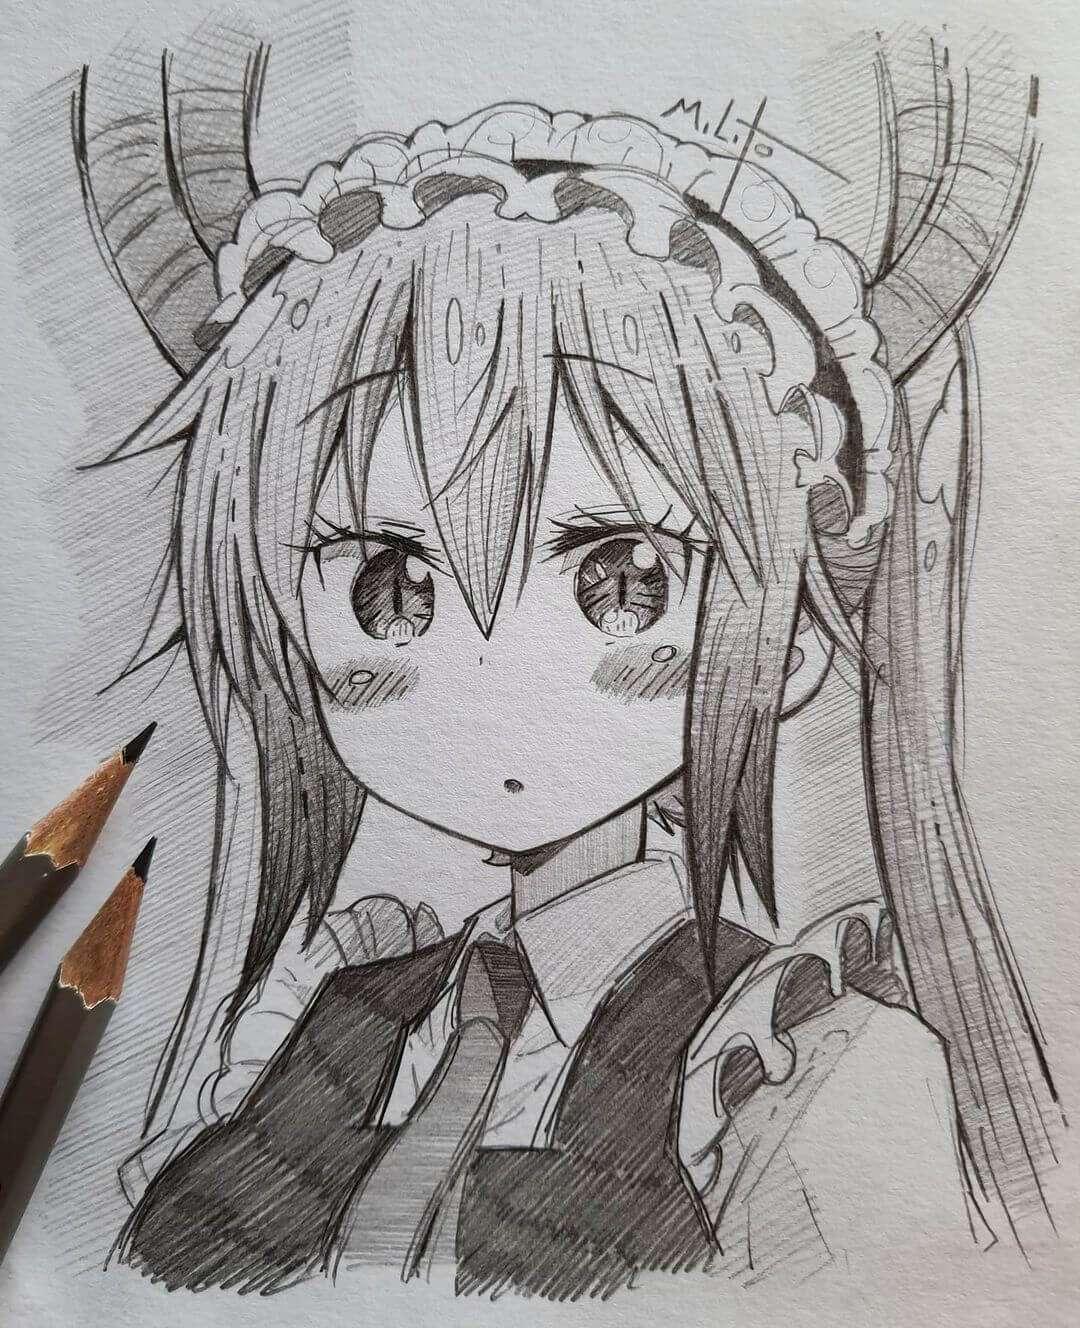 Tohru (Kobayashi-san chi no Maid Dragon) by milito3.art